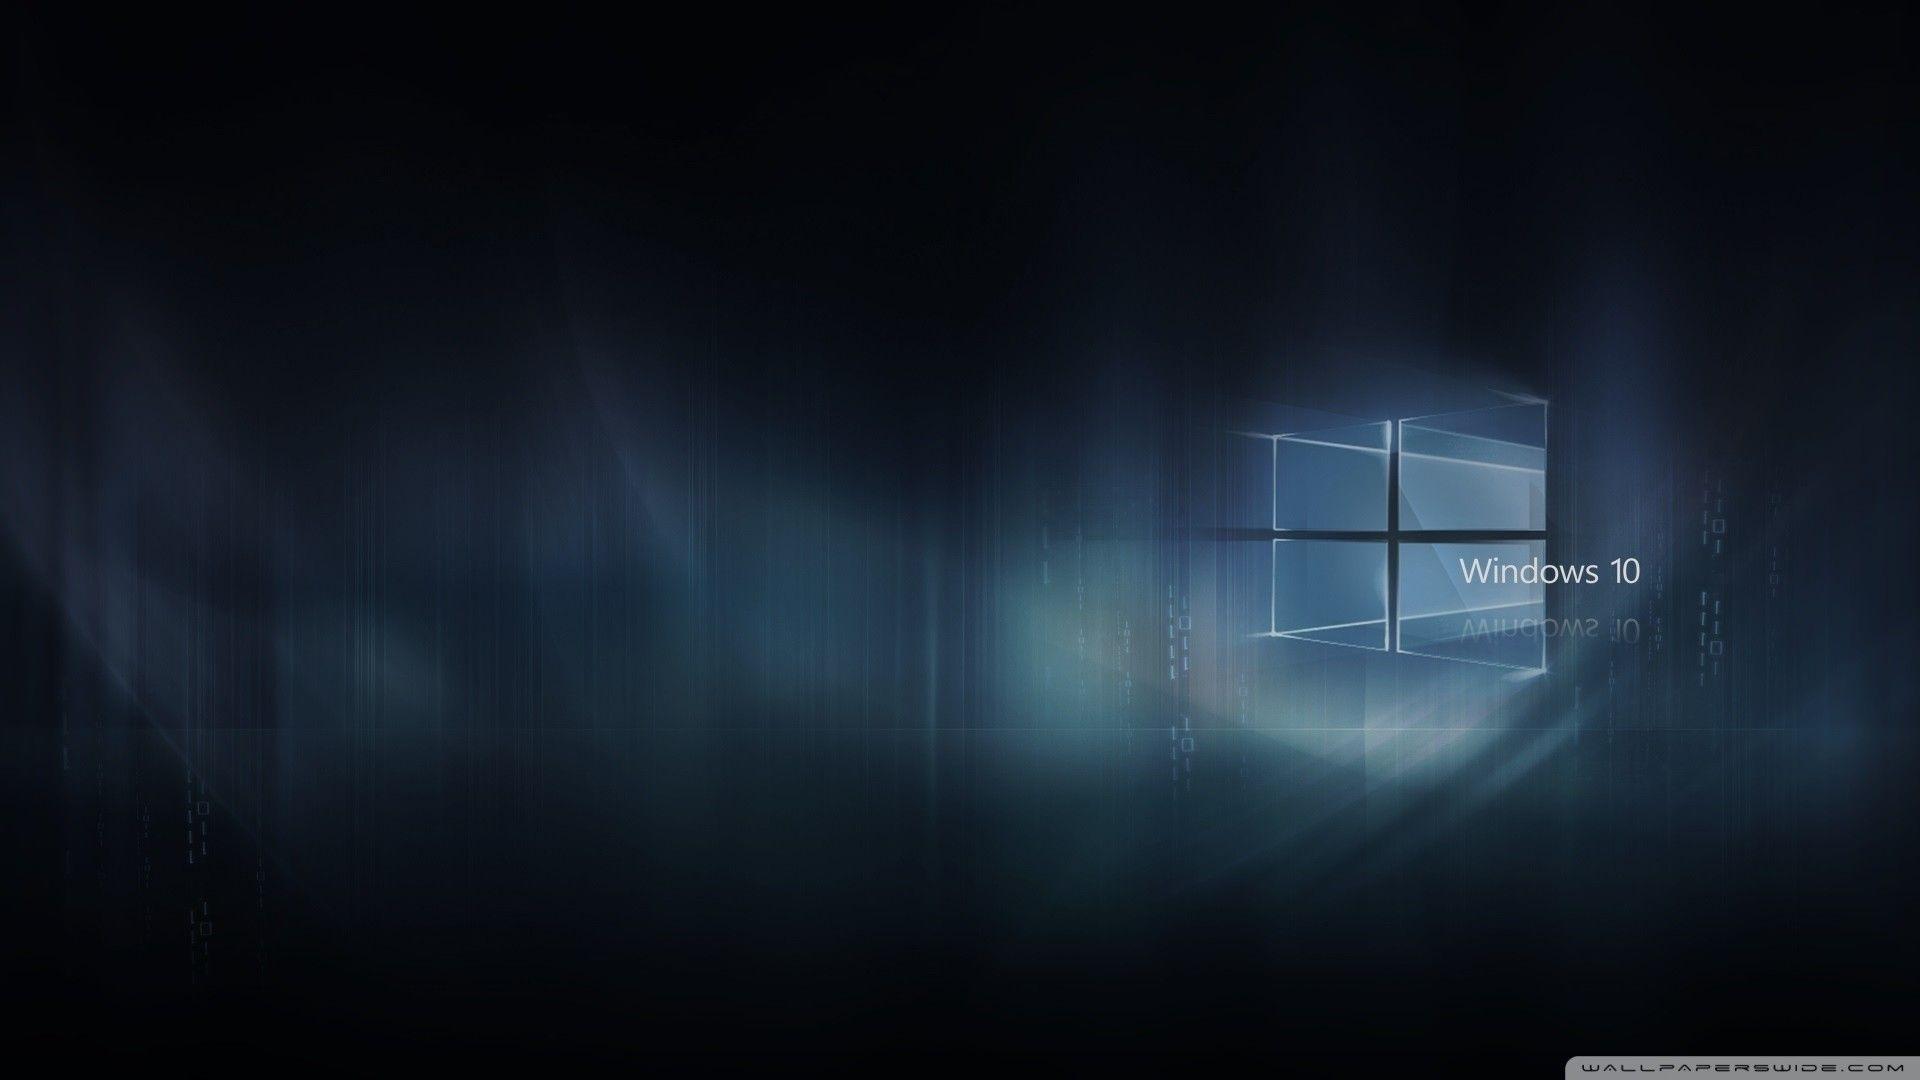 14 Windows 10 Wallpaper Hd 1920x1080 Download 2k Wonderful Images Fondos Pantalla Windows 10 Fondo De Pantalla De Inconformista Windows 10